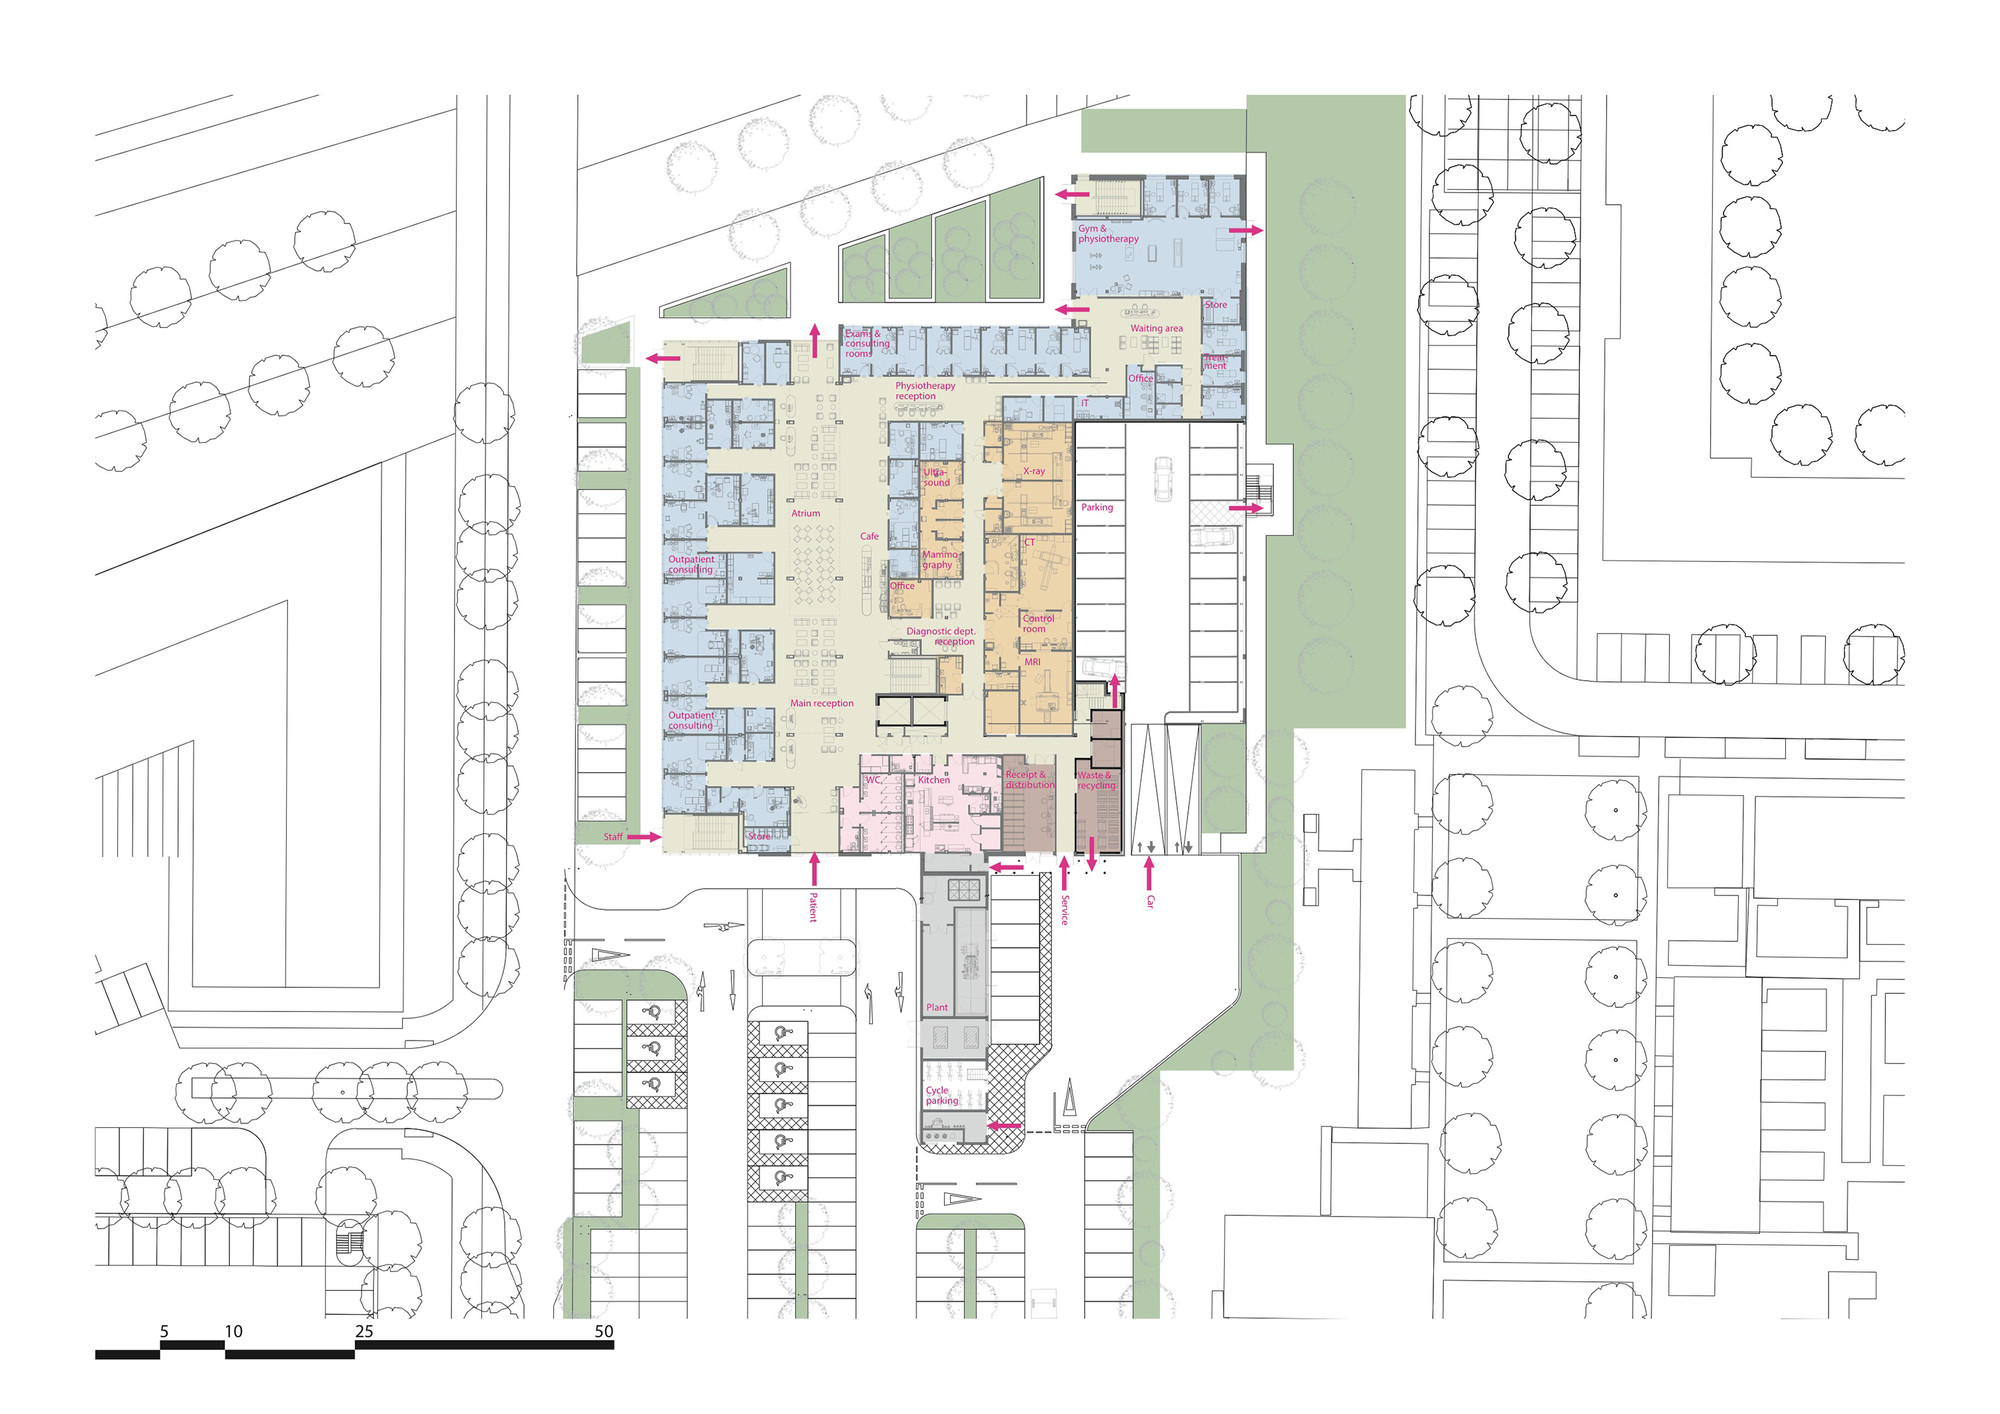 circle reading hospital brydenwood ground floor plan [ 2000 x 1414 Pixel ]